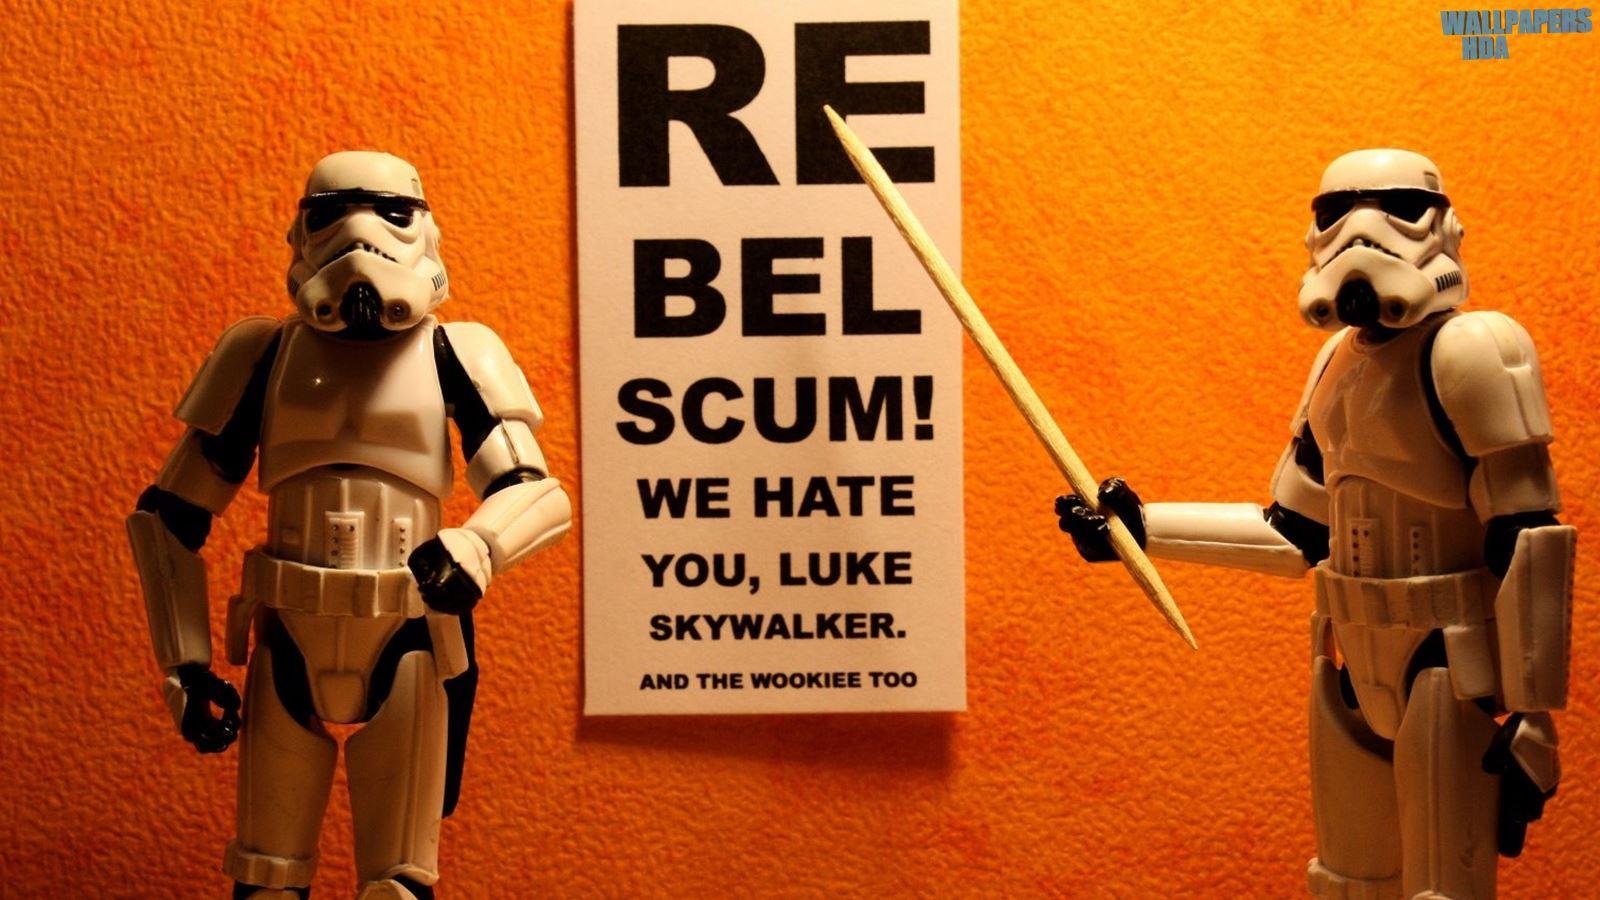 Star wars toys wallpaper 1600x900